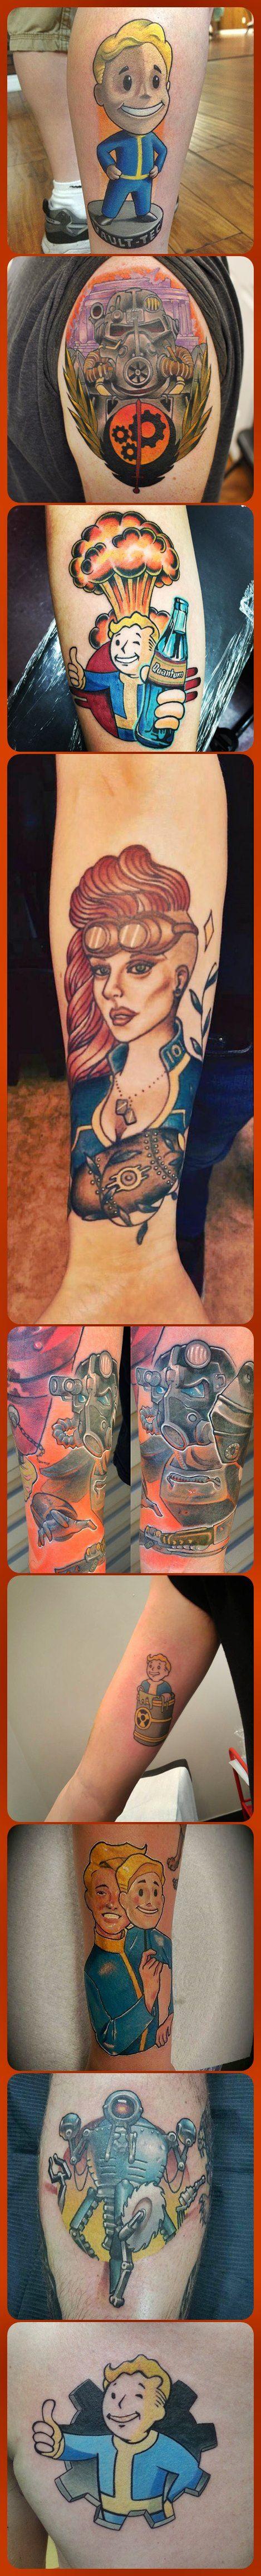 23 Best Fallout 4 Tattoo Ideas http://www.spiritustattoo.com/23-best-fallout-4-tattoo-ideas/